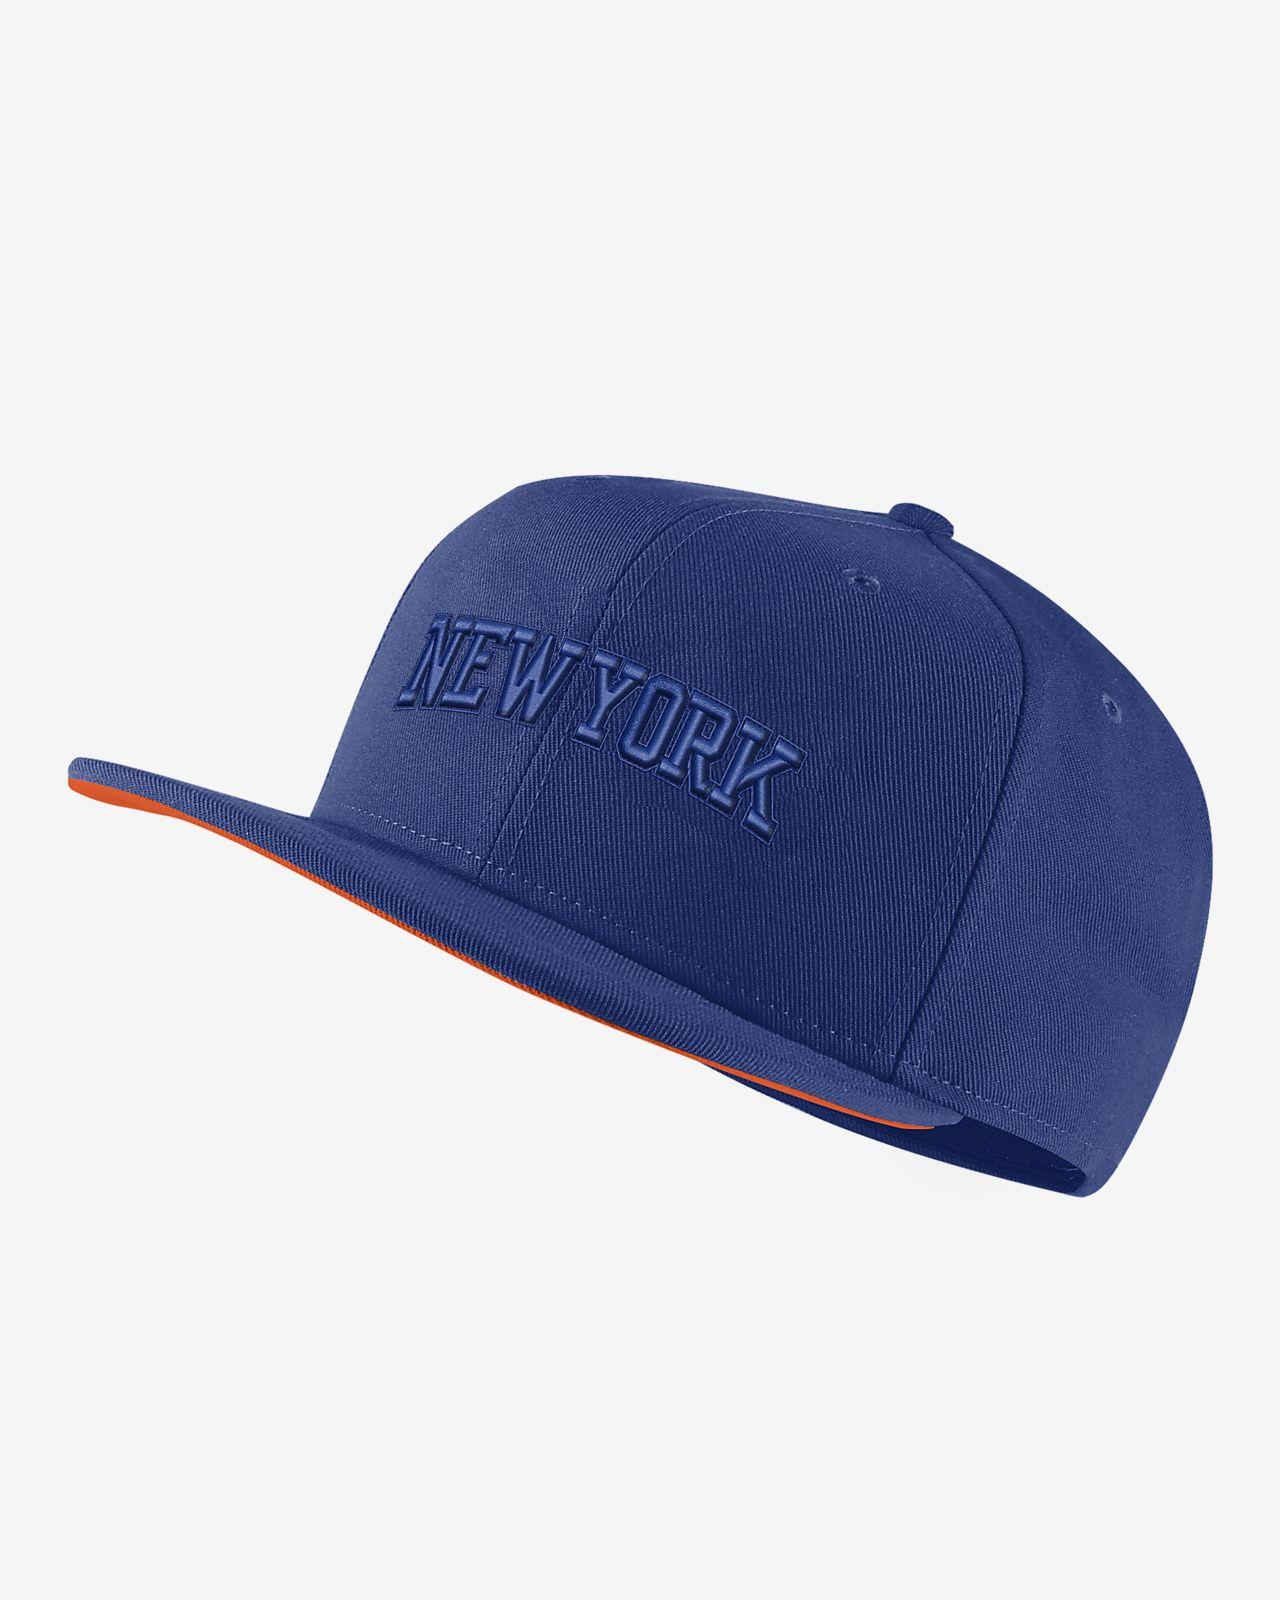 New York Knicks Nike AeroBill Gorra de la NBA